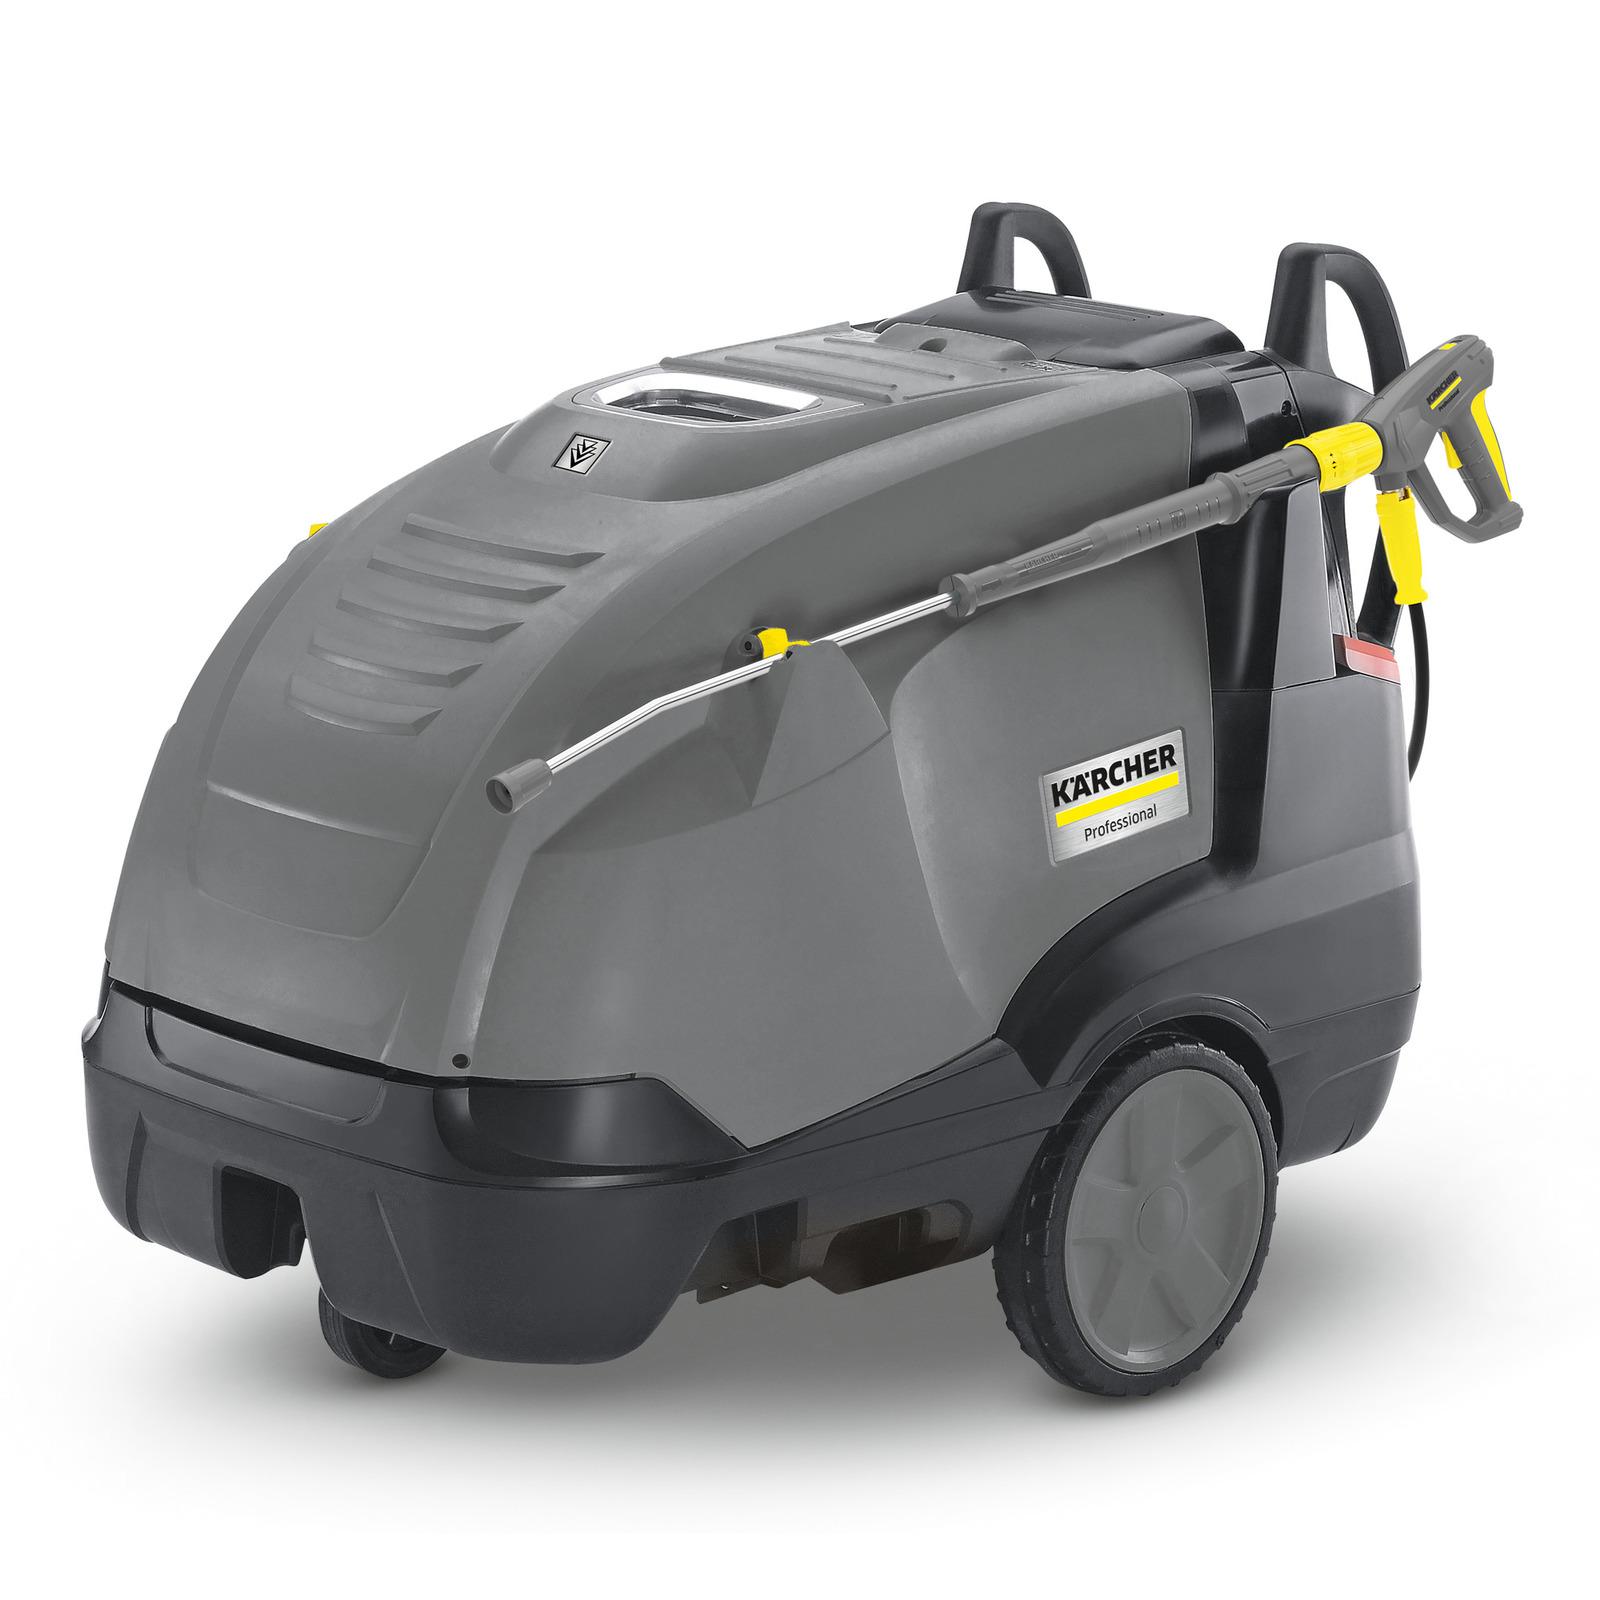 HDS 10/20-4 MX VT čistič